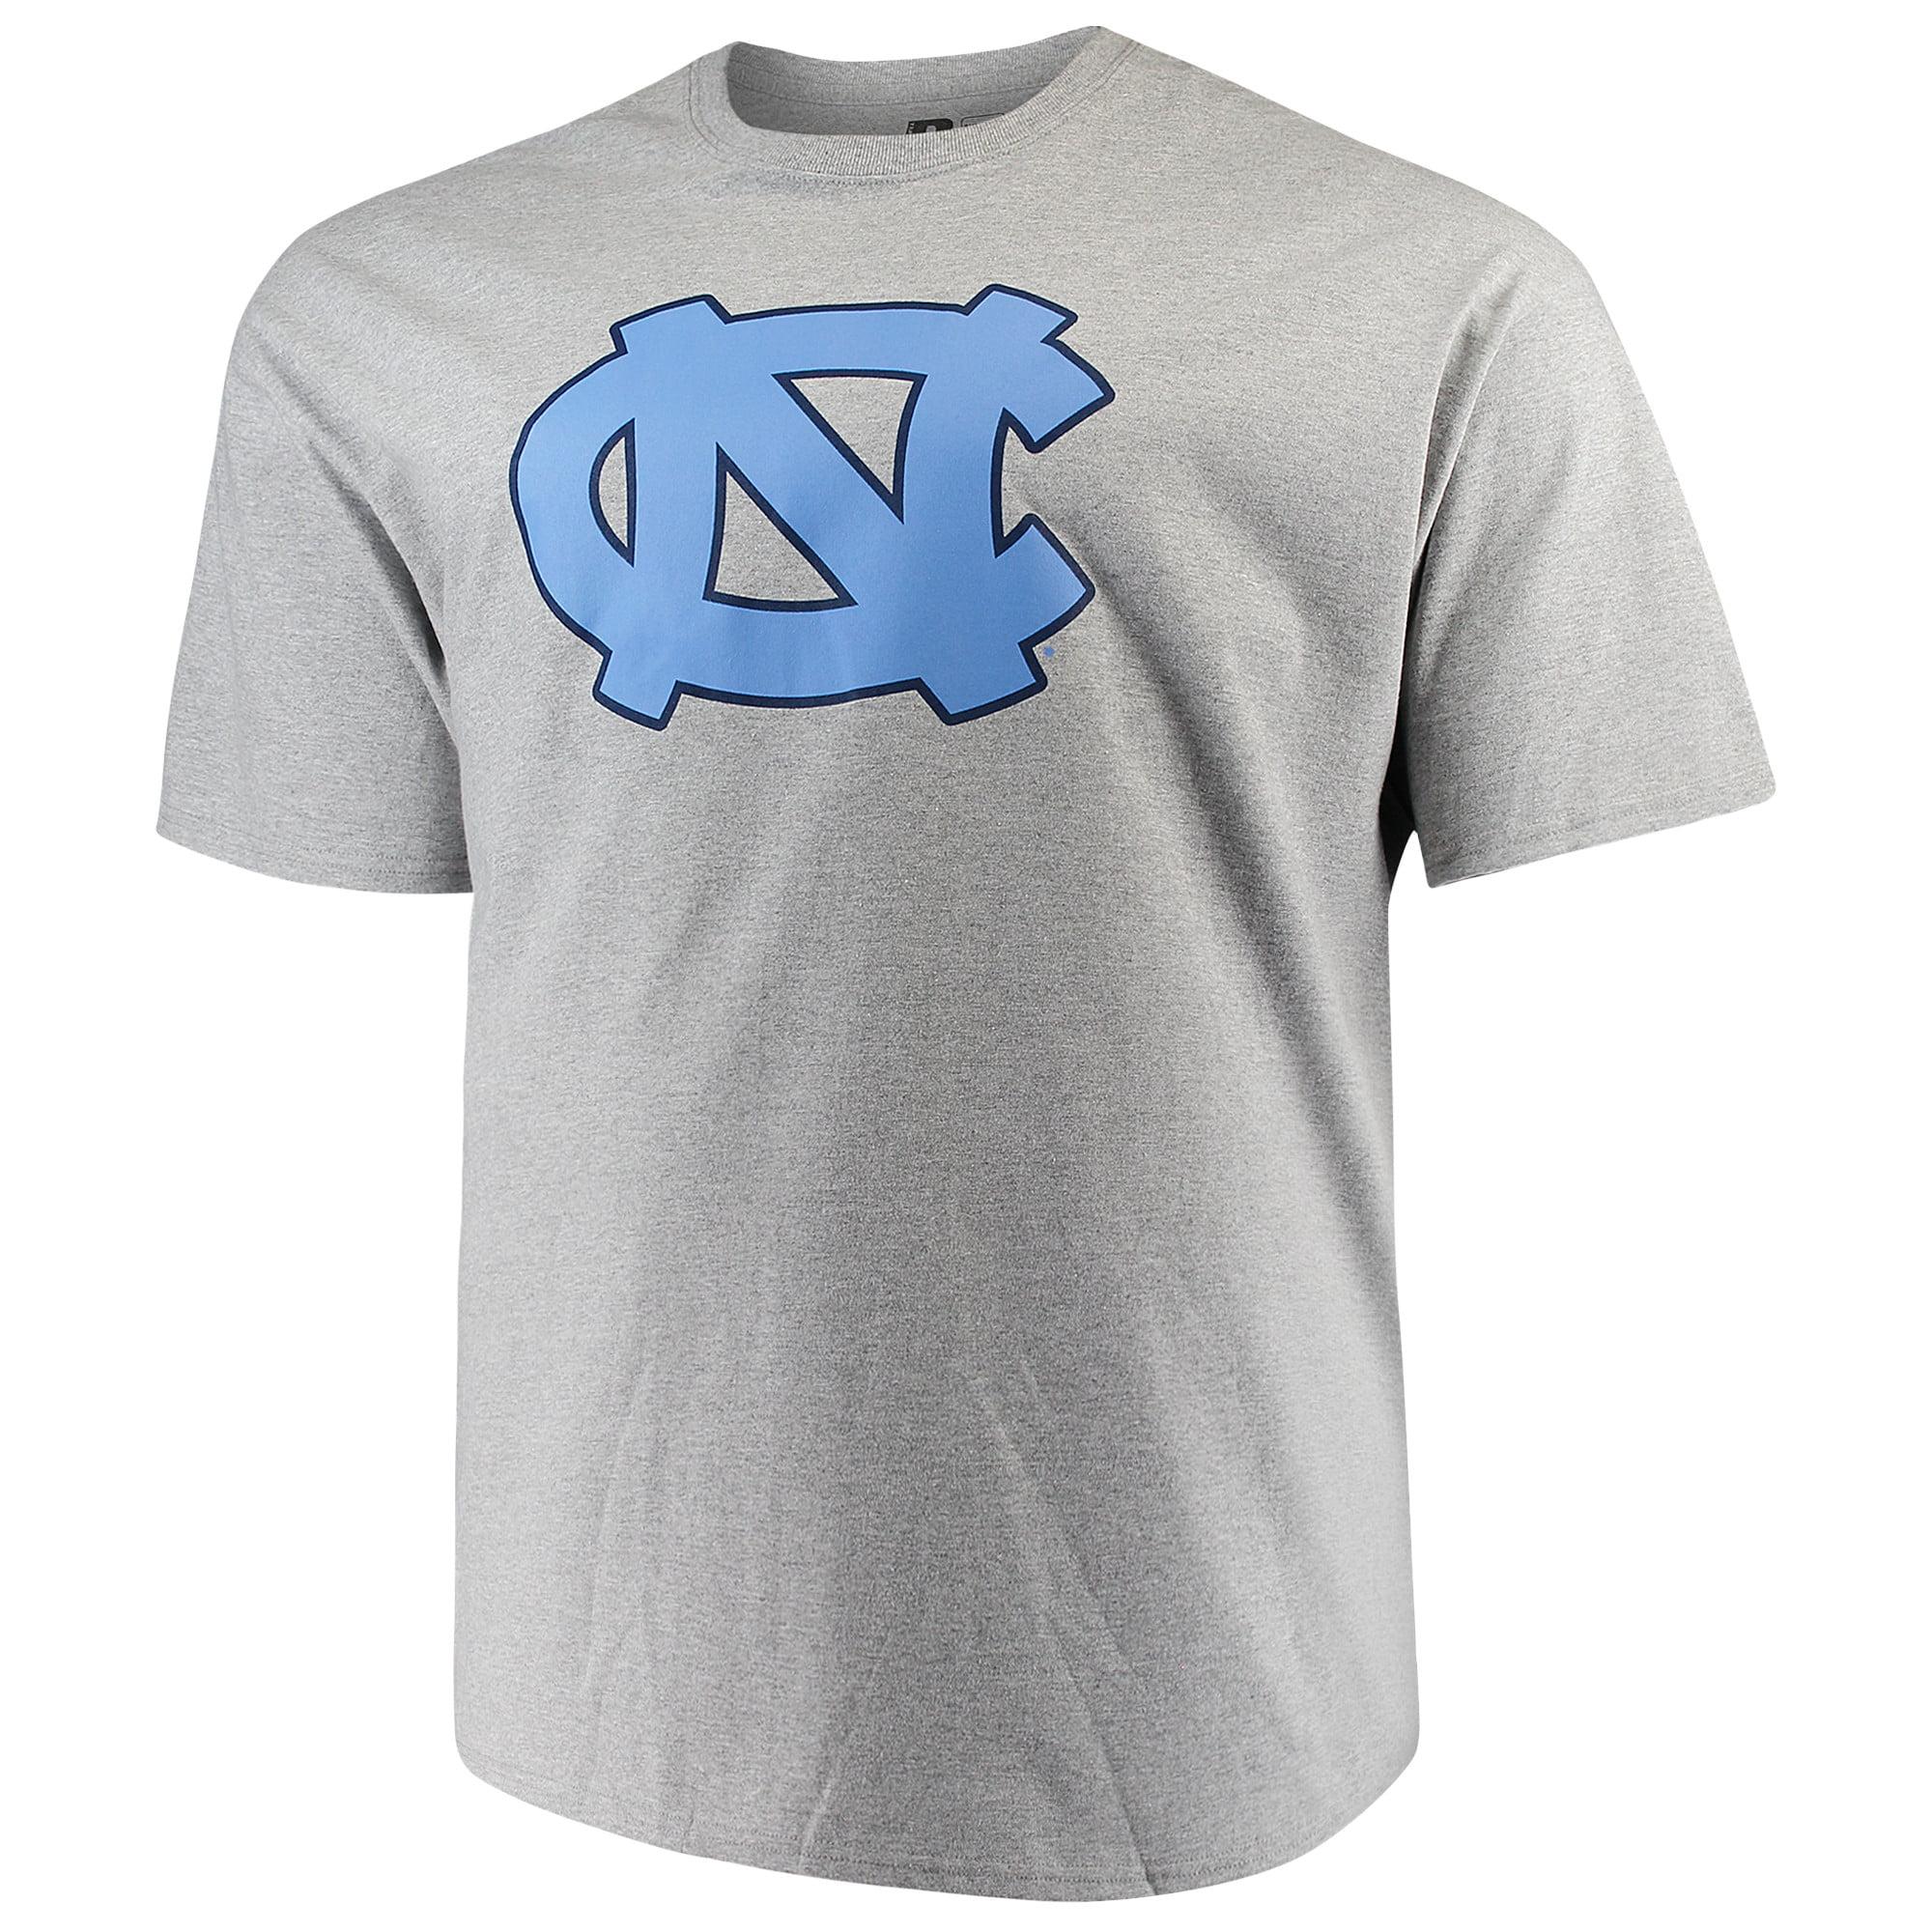 Men's Heathered Gray North Carolina Tar Heels Big & Tall Classic Crew Neck T-Shirt